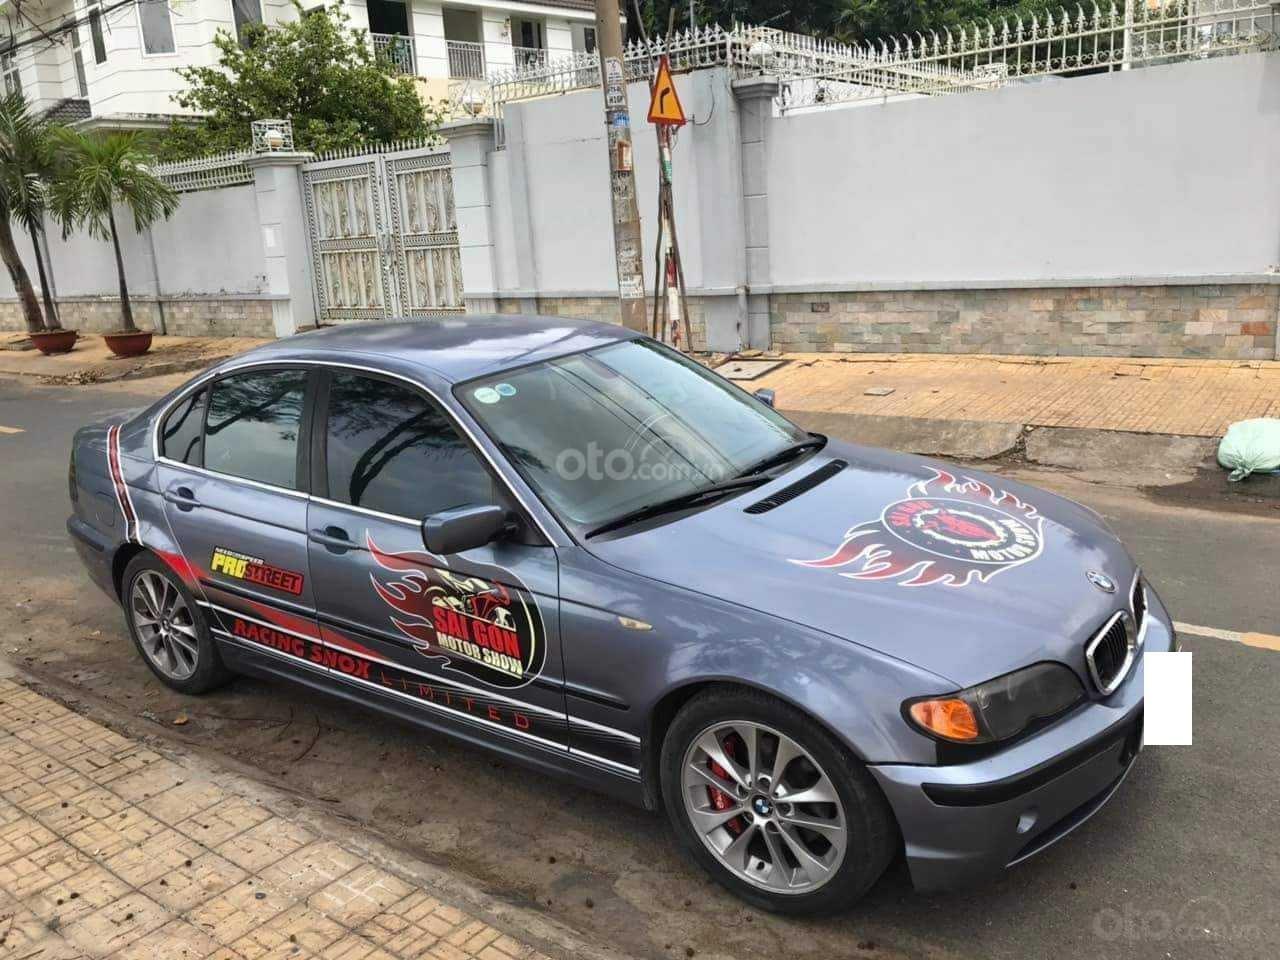 Cần bán BMW 325i Sport date 2003 (2)